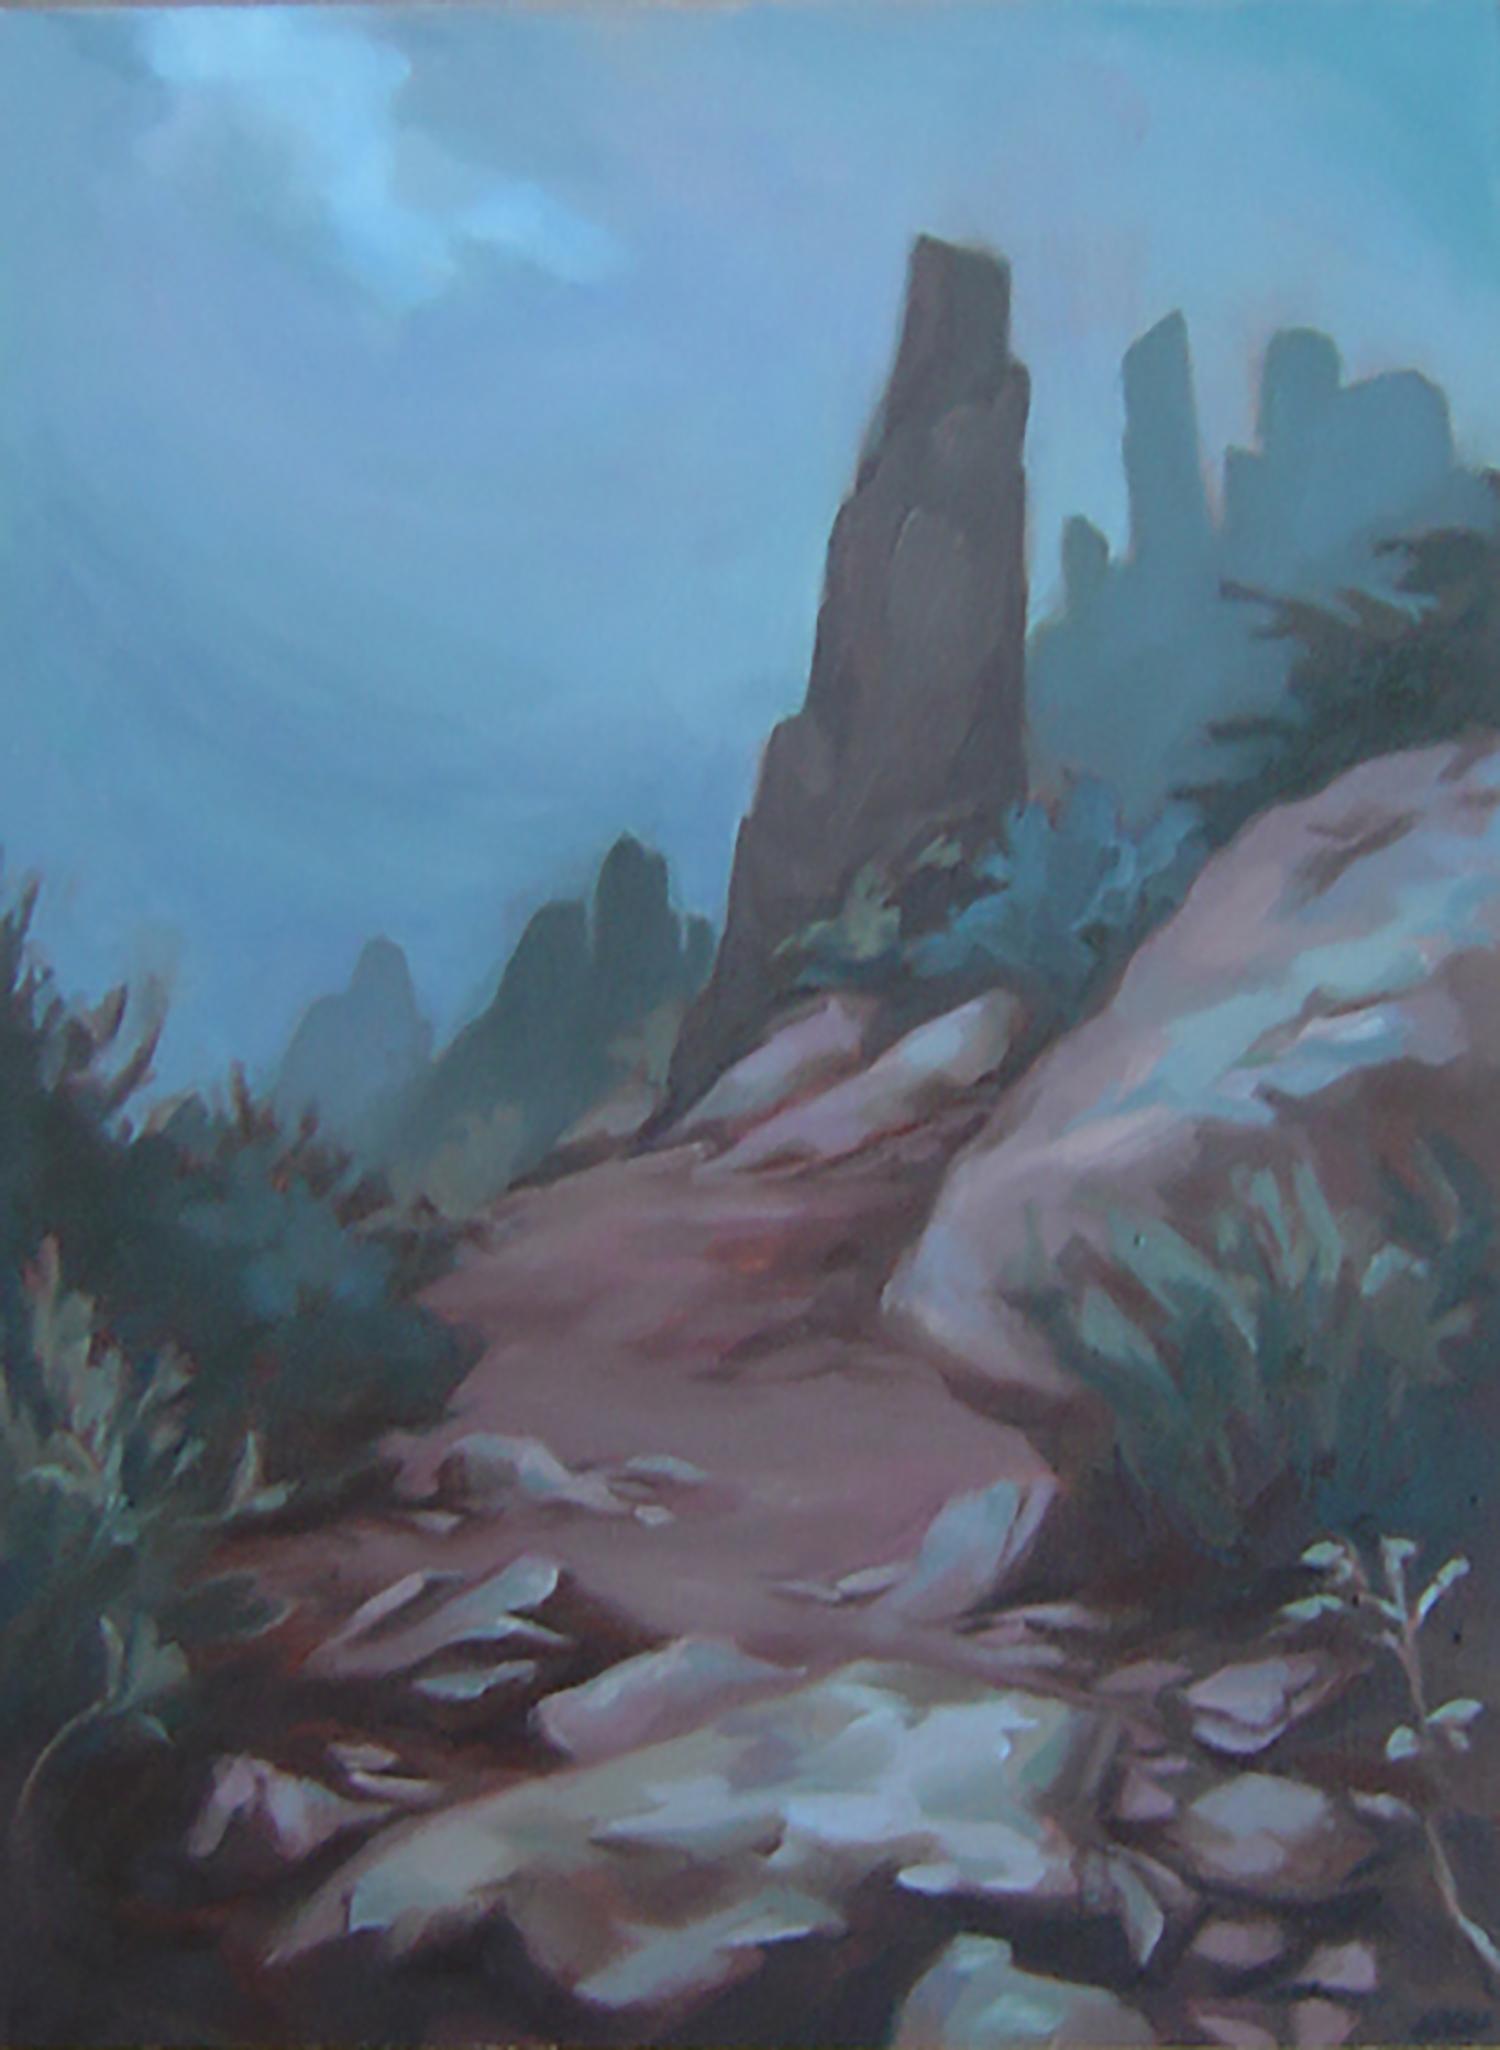 Pima Indian Legend of the Stone Sentinels